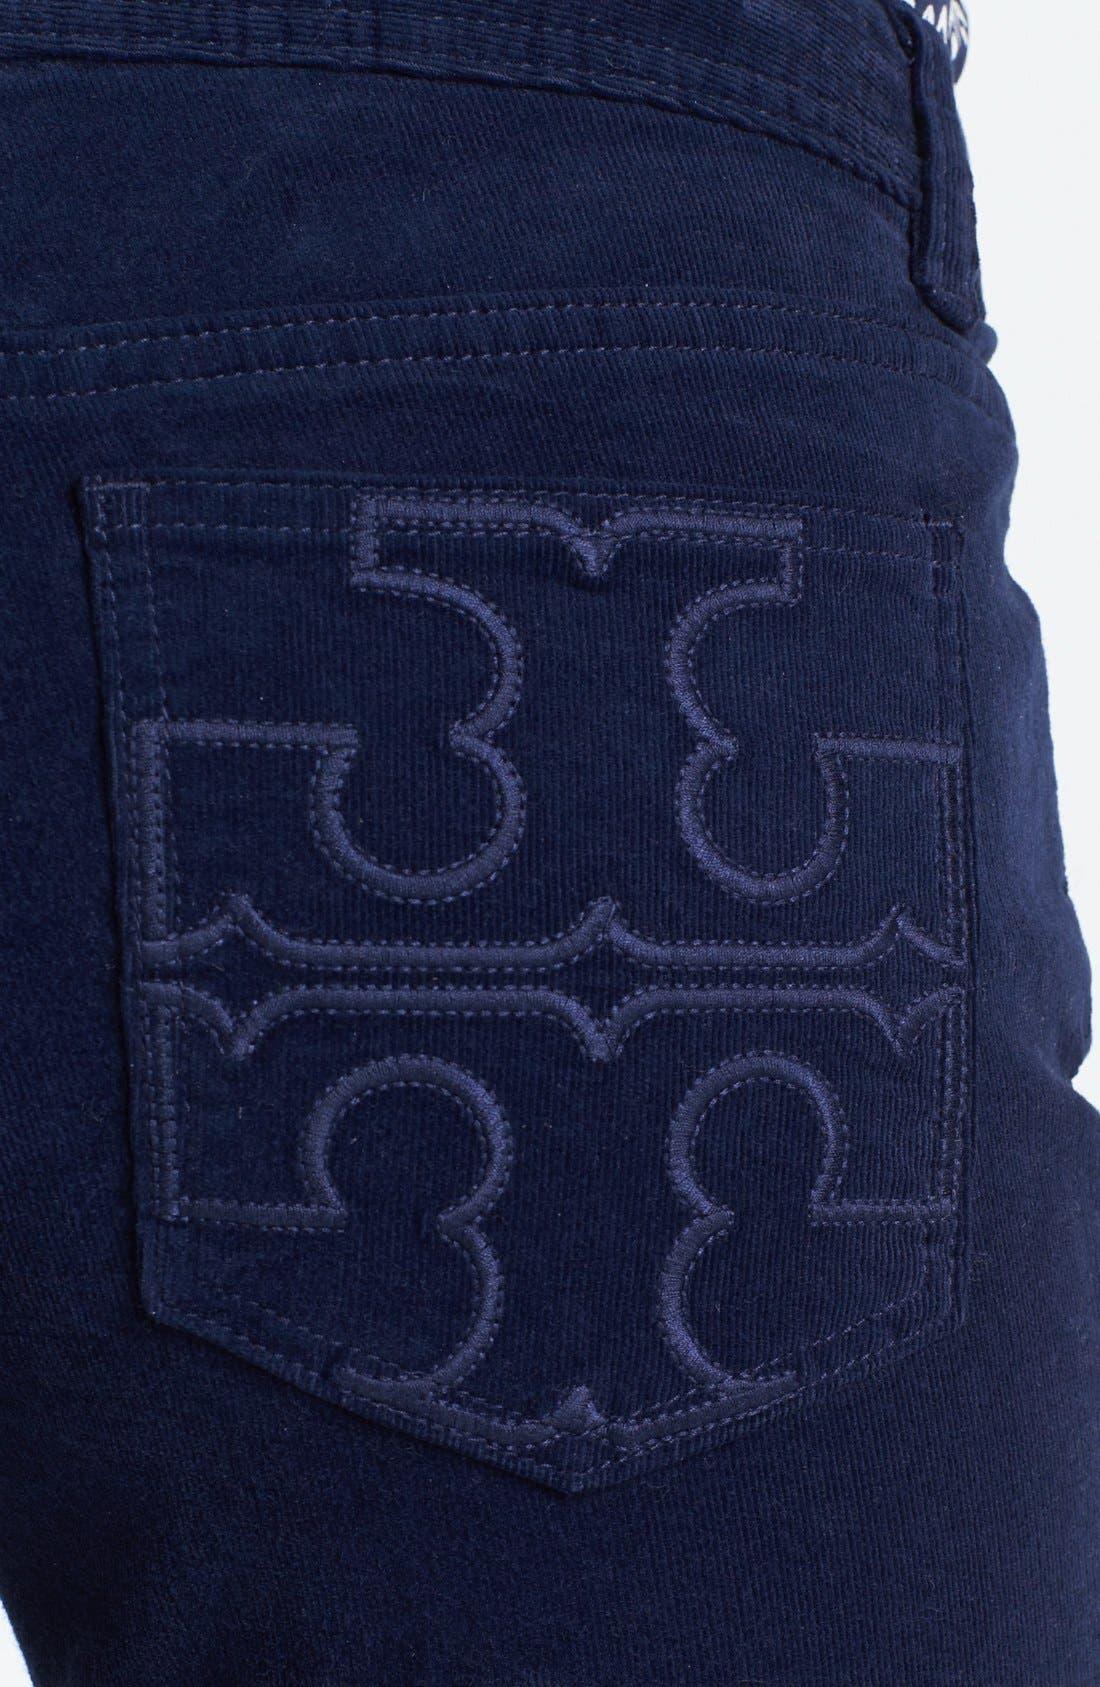 Alternate Image 3  - Tory Burch 'Classic Tory' Corduroy Pants